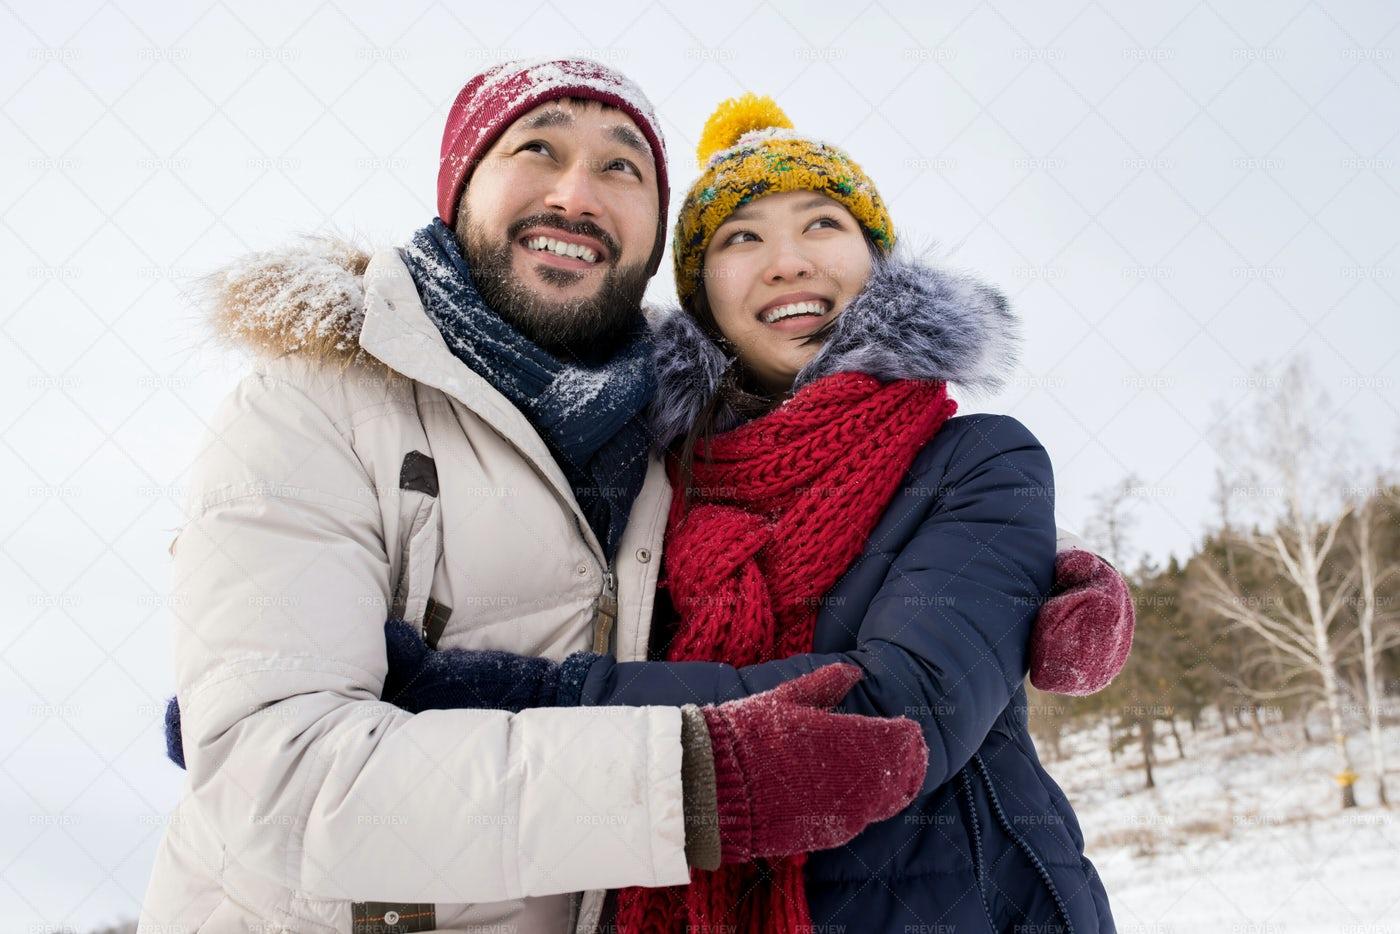 Asian Couple On Winter Vacation: Stock Photos